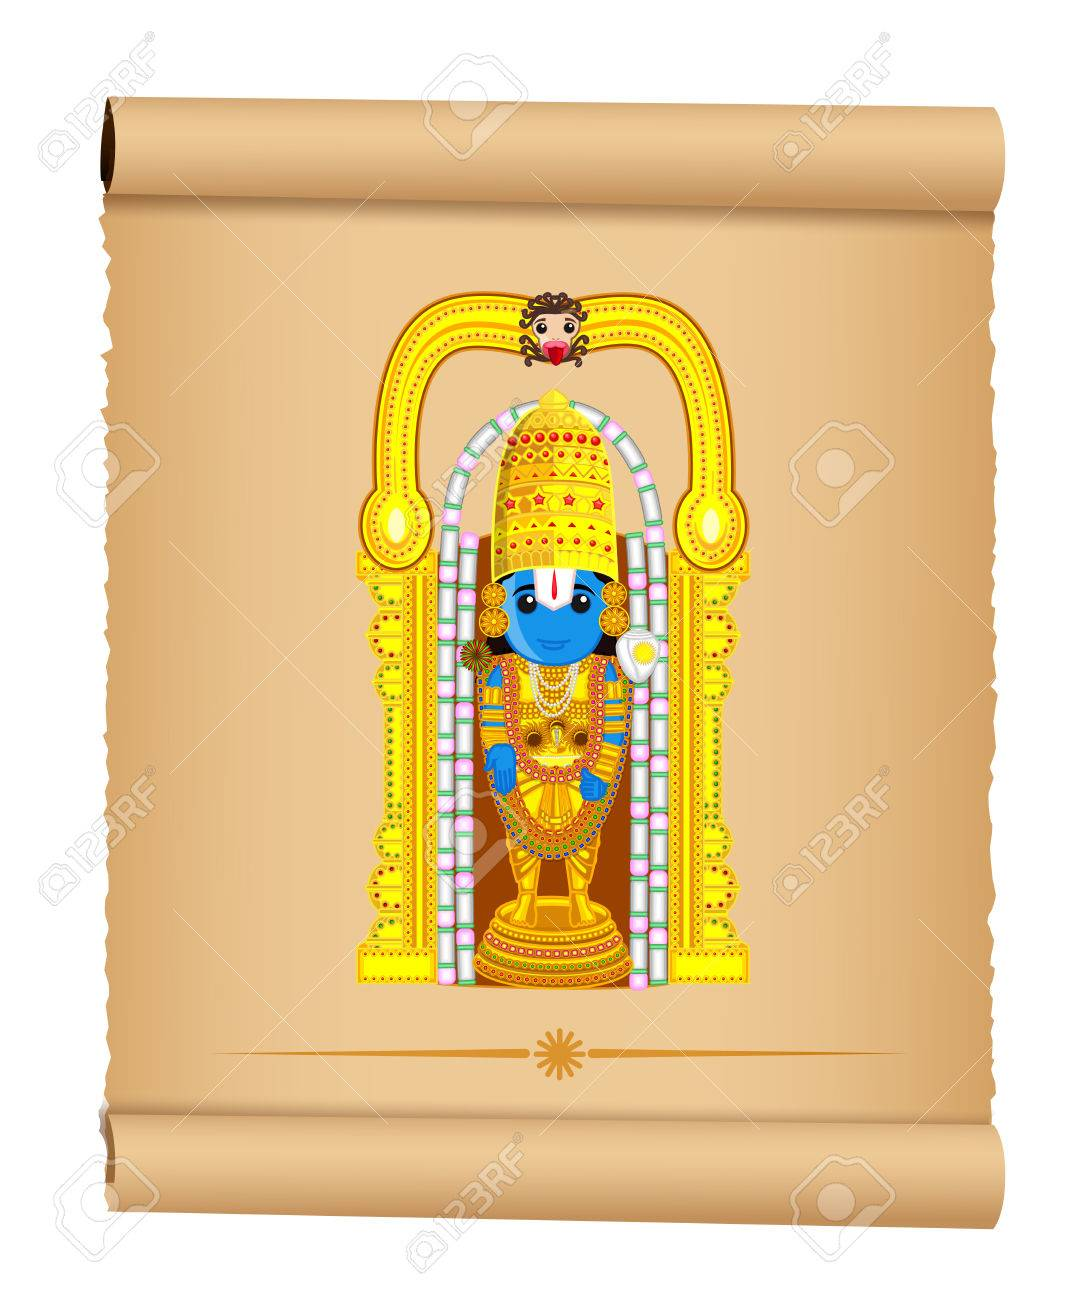 Lord Venkateswara Indian God Royalty Free Cliparts Vectors And Stock Illustration Image 41847375